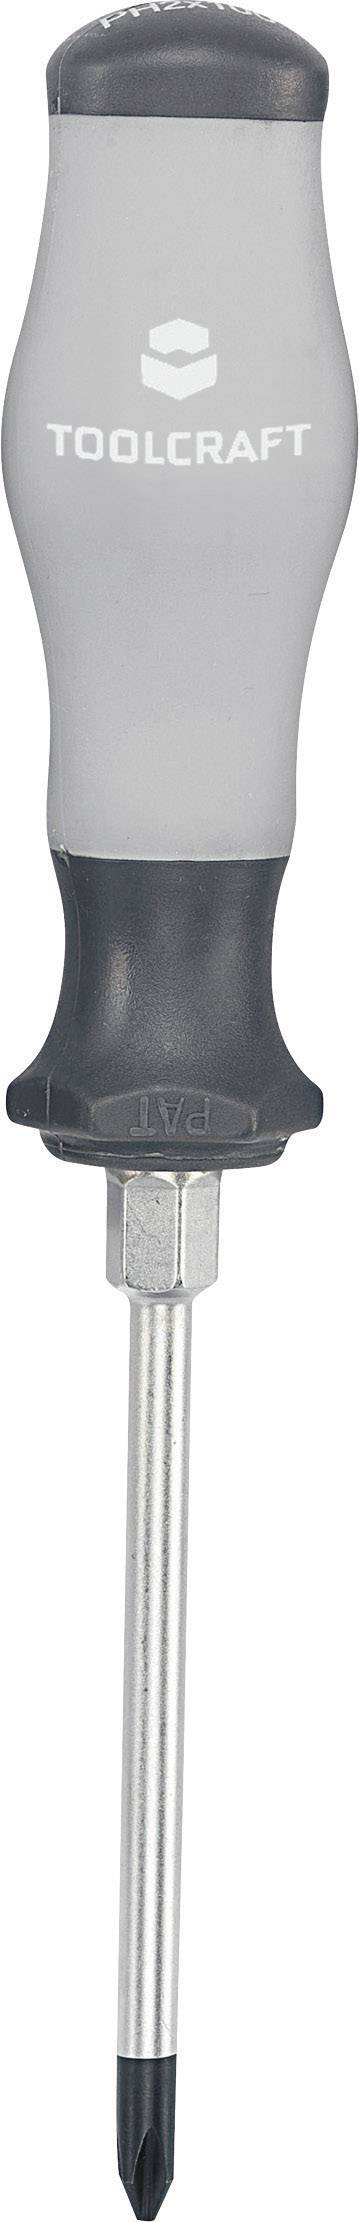 Krížový skrutkovač TOOLCRAFT 820739, PH 1, dĺžka čepele: 75 mm